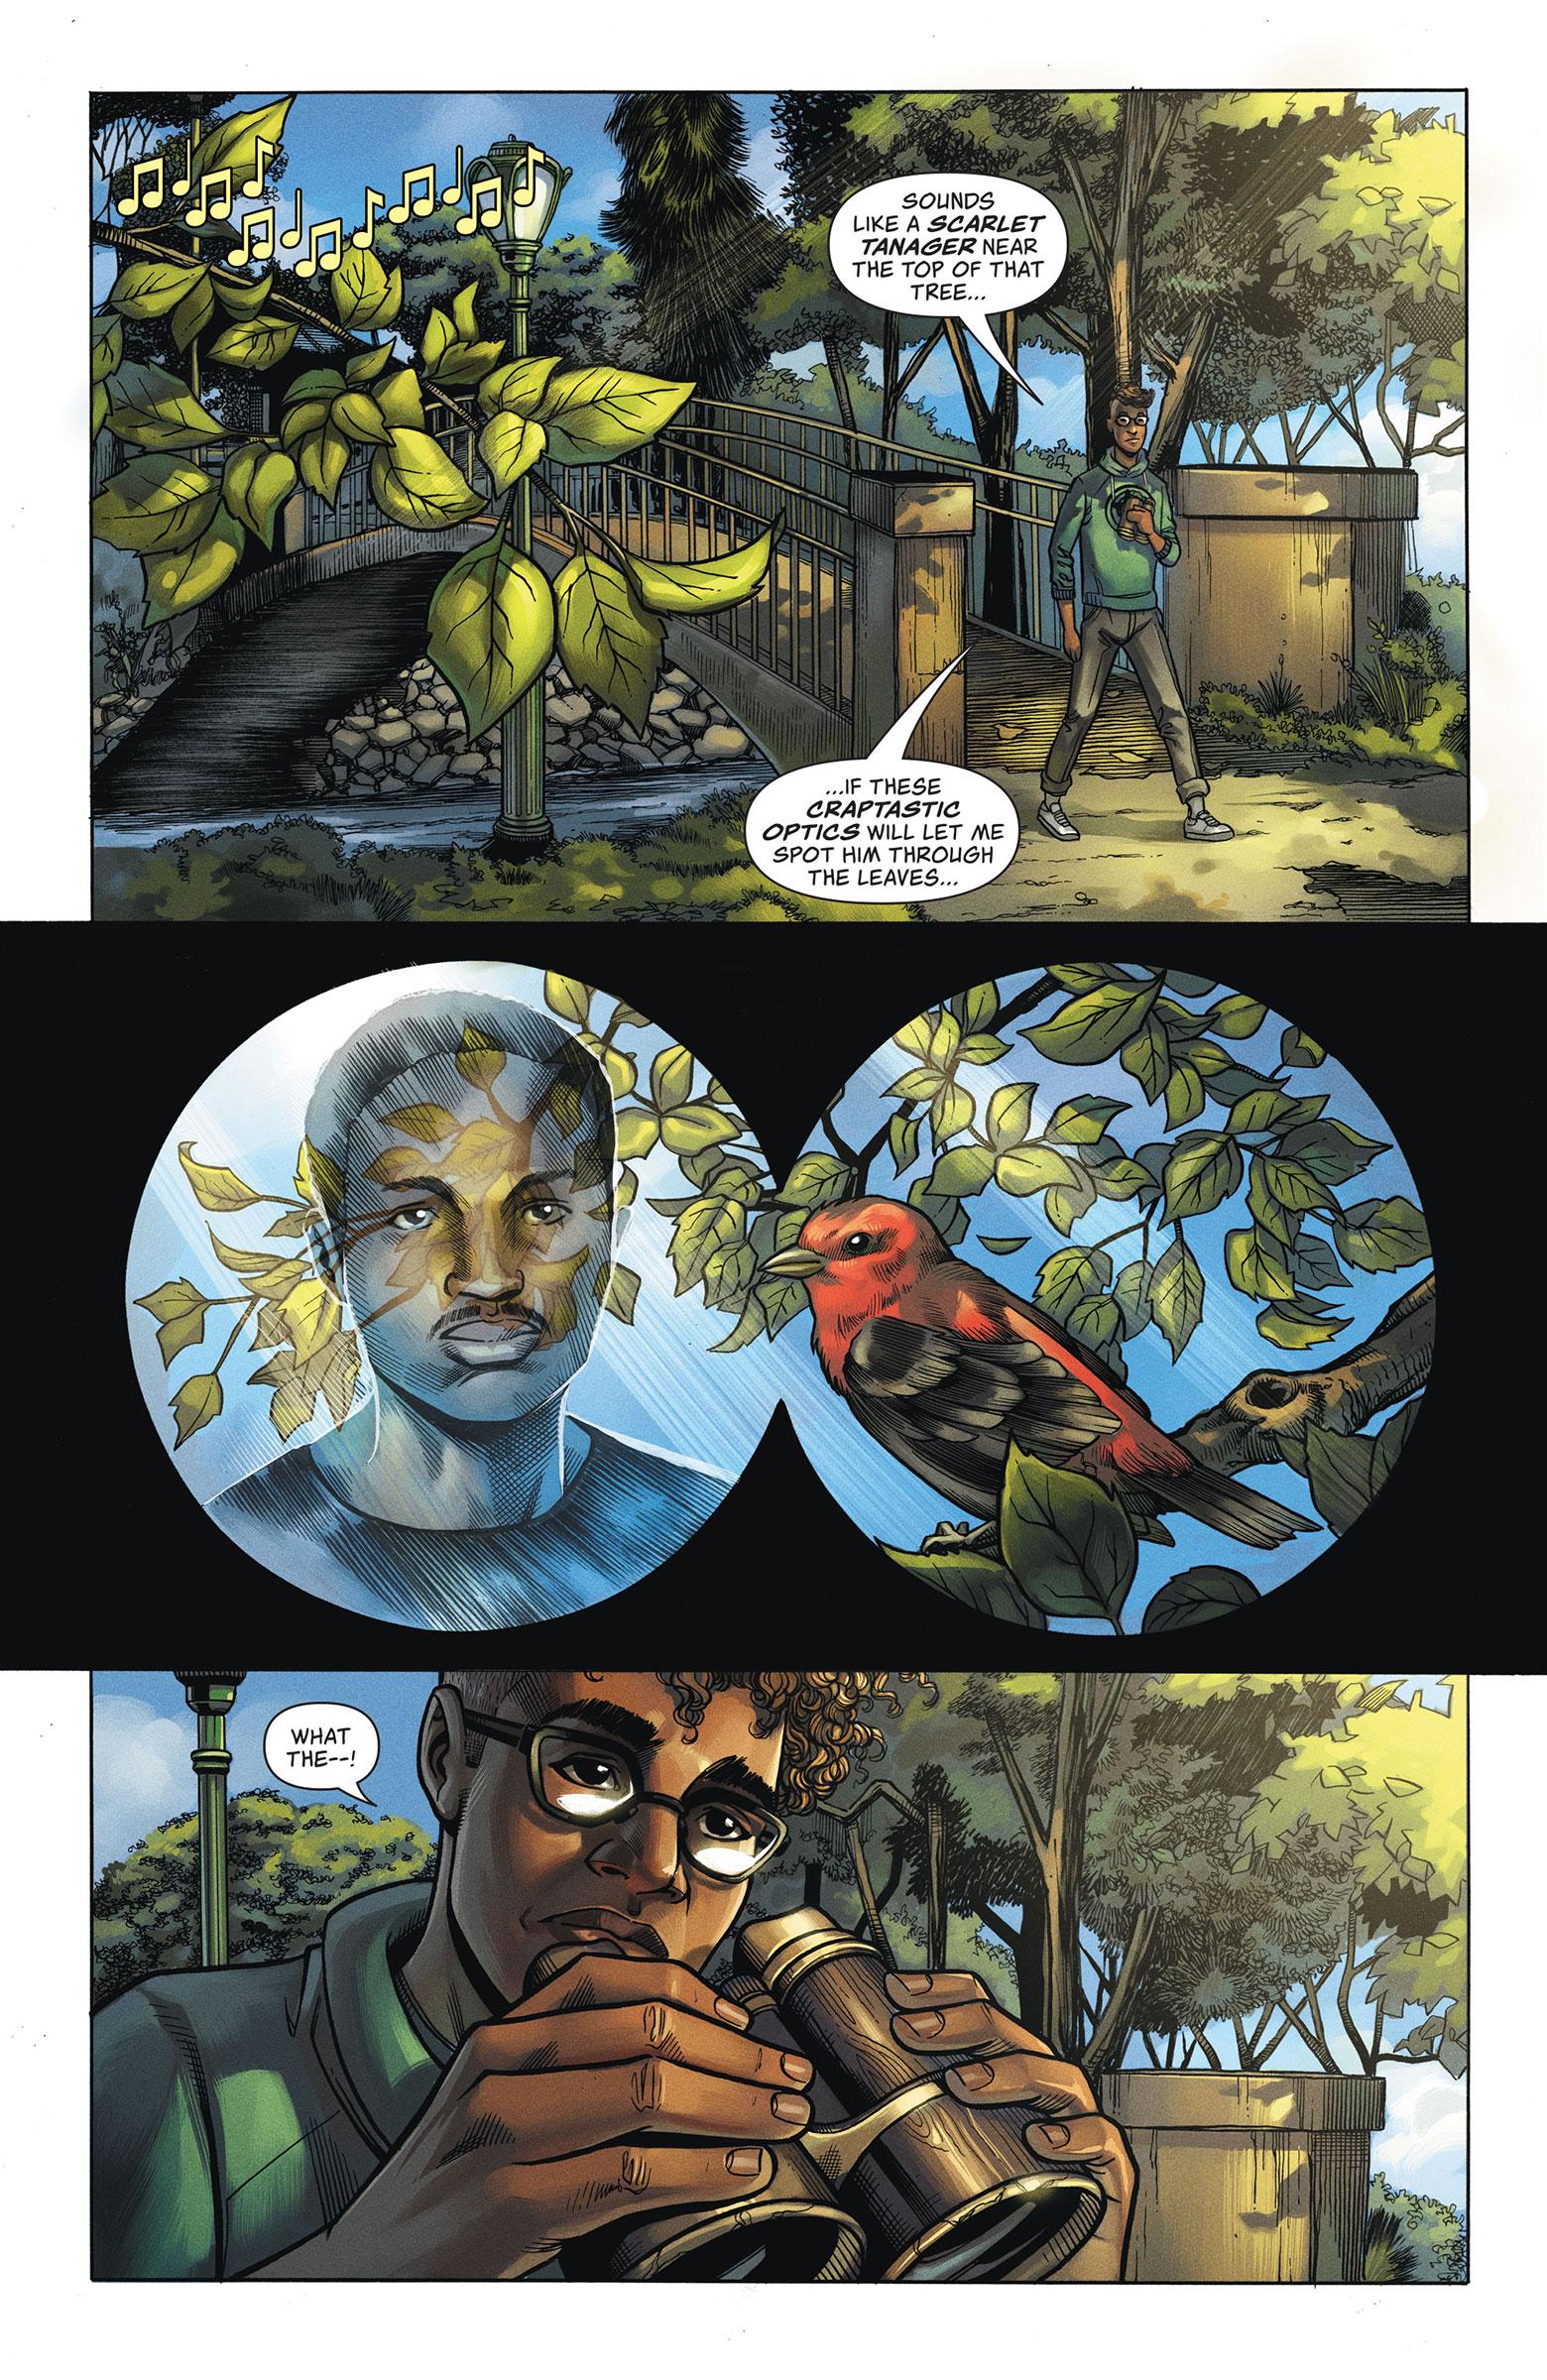 Comic: Courtesy of DC